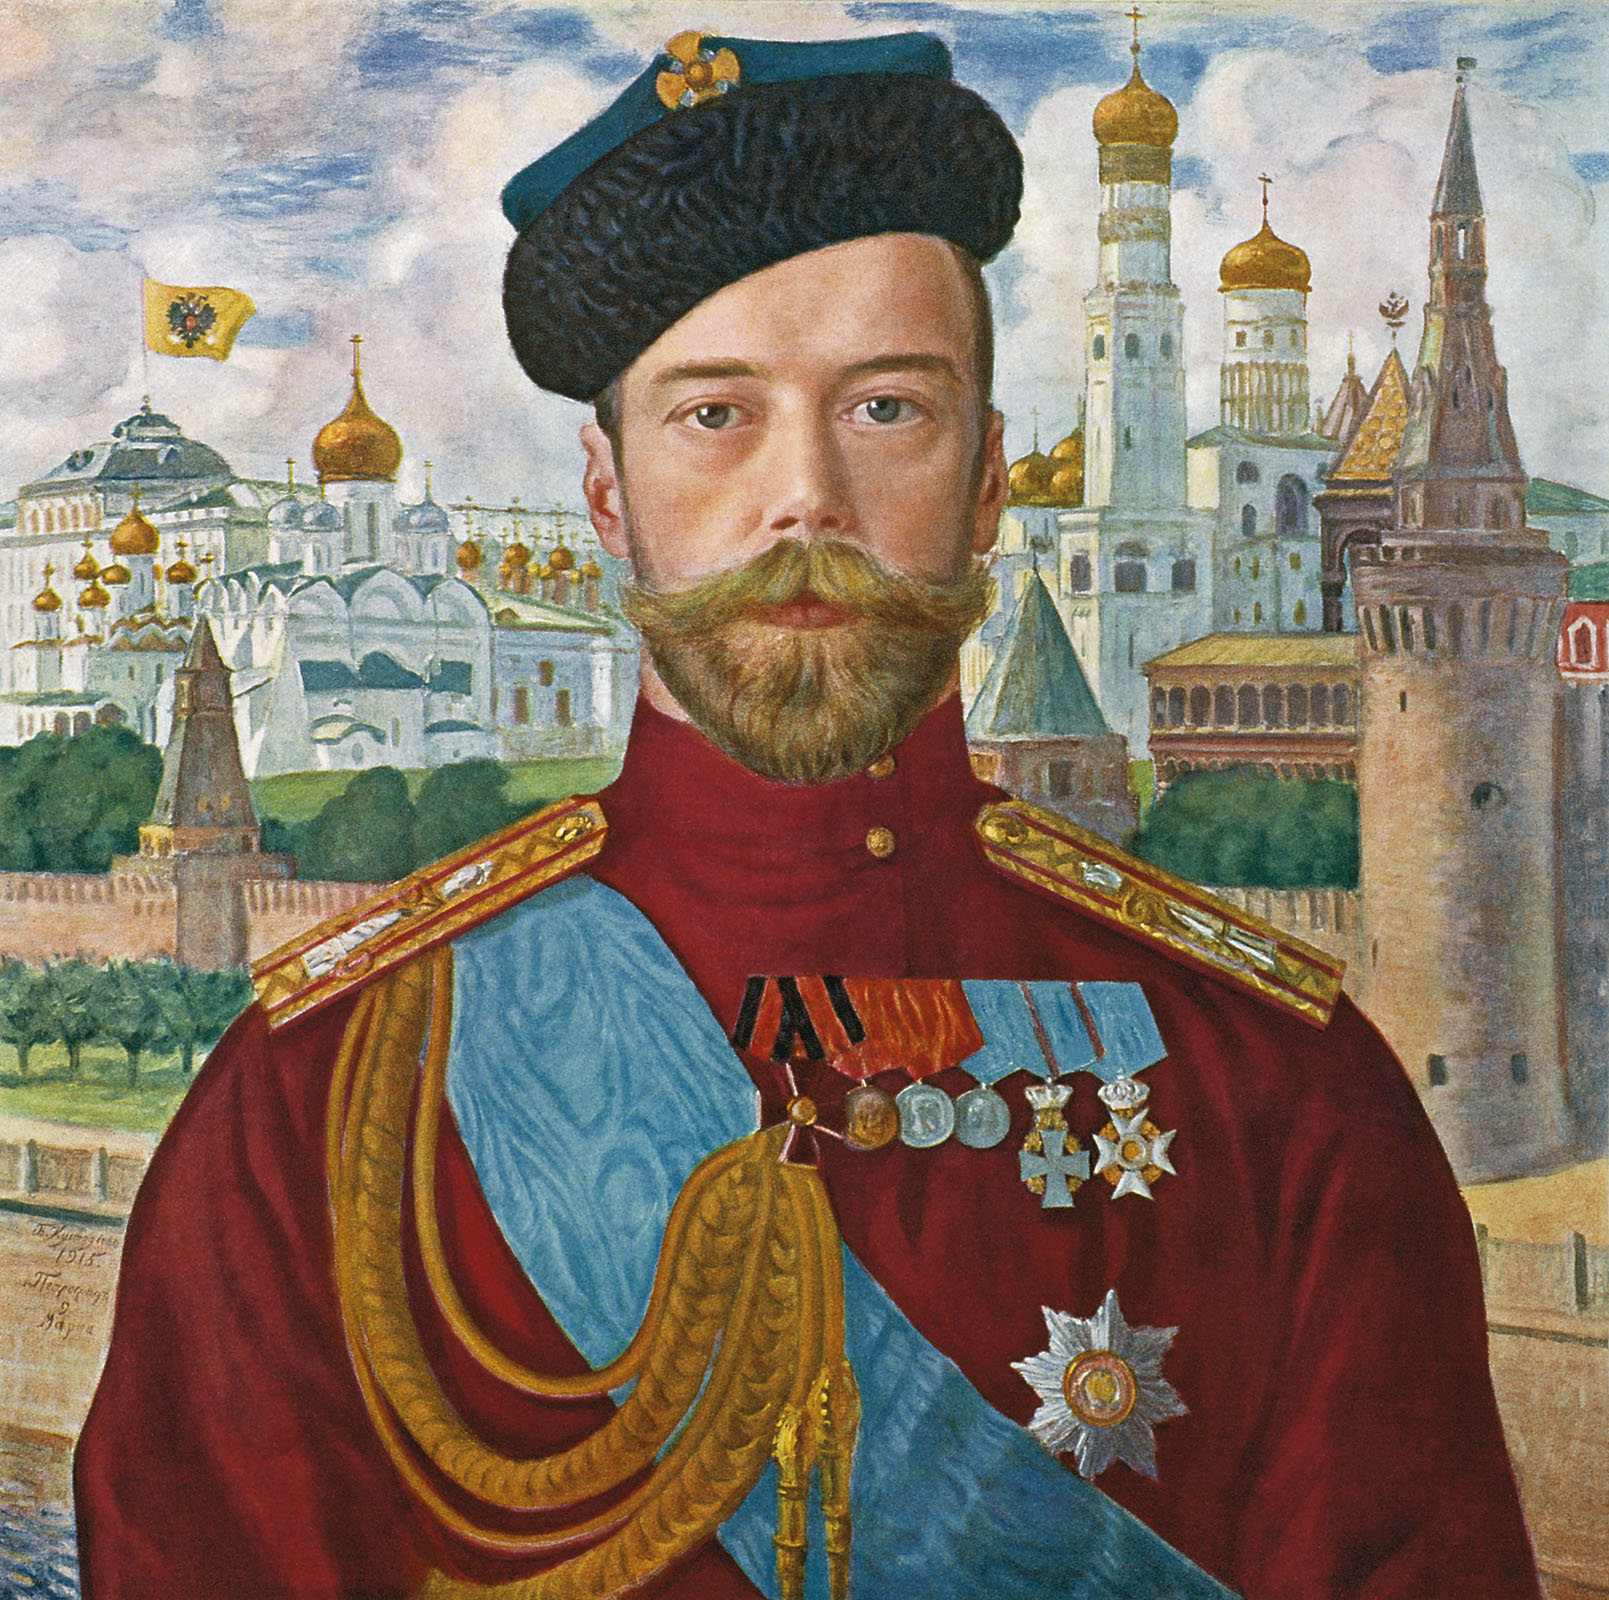 https://i0.wp.com/upload.wikimedia.org/wikipedia/commons/f/fa/Tsar_nikolai.jpg